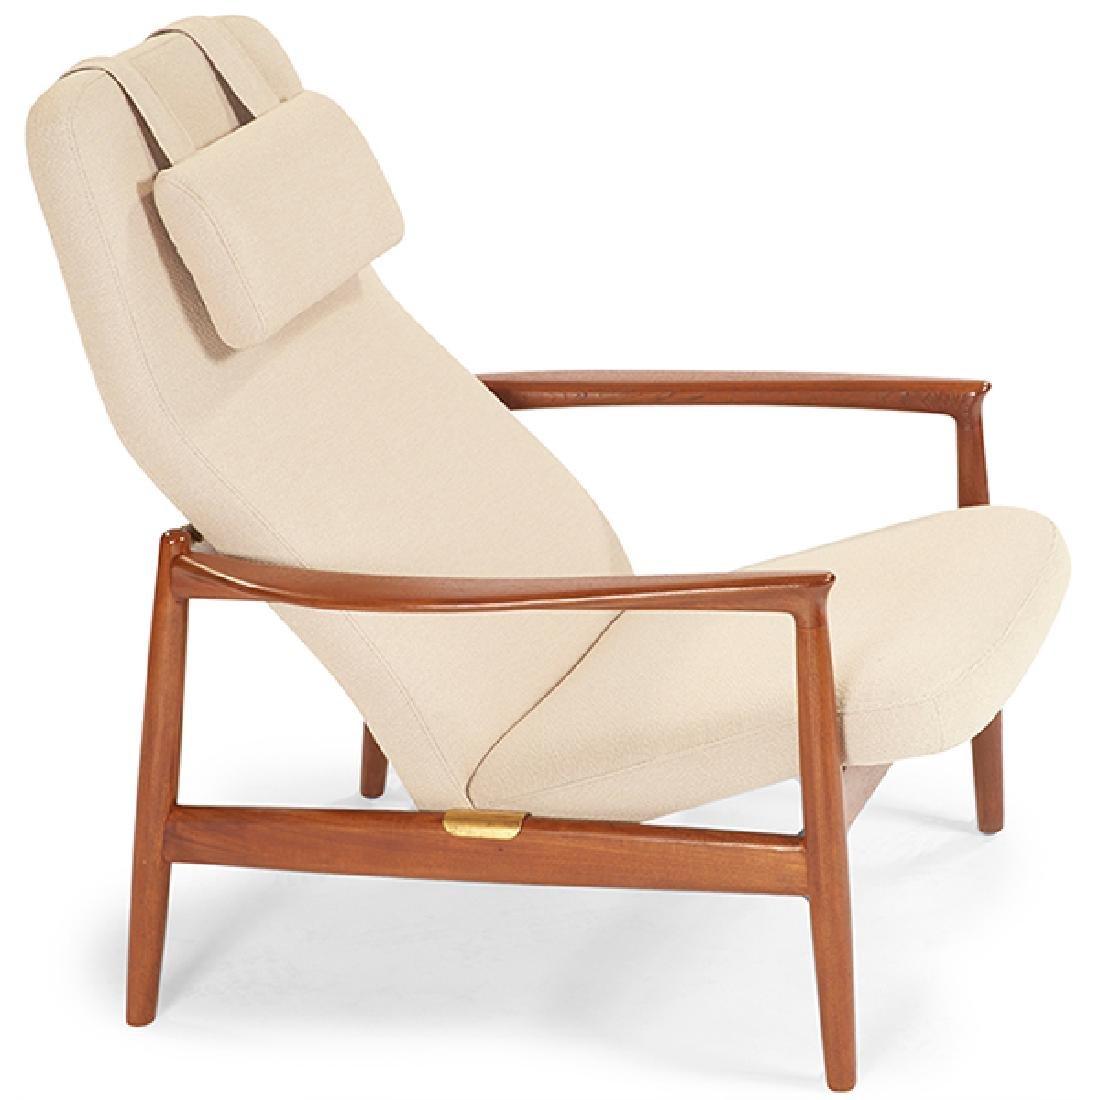 Folke Ohlsson (1919-2003) for Dux, lounge chair